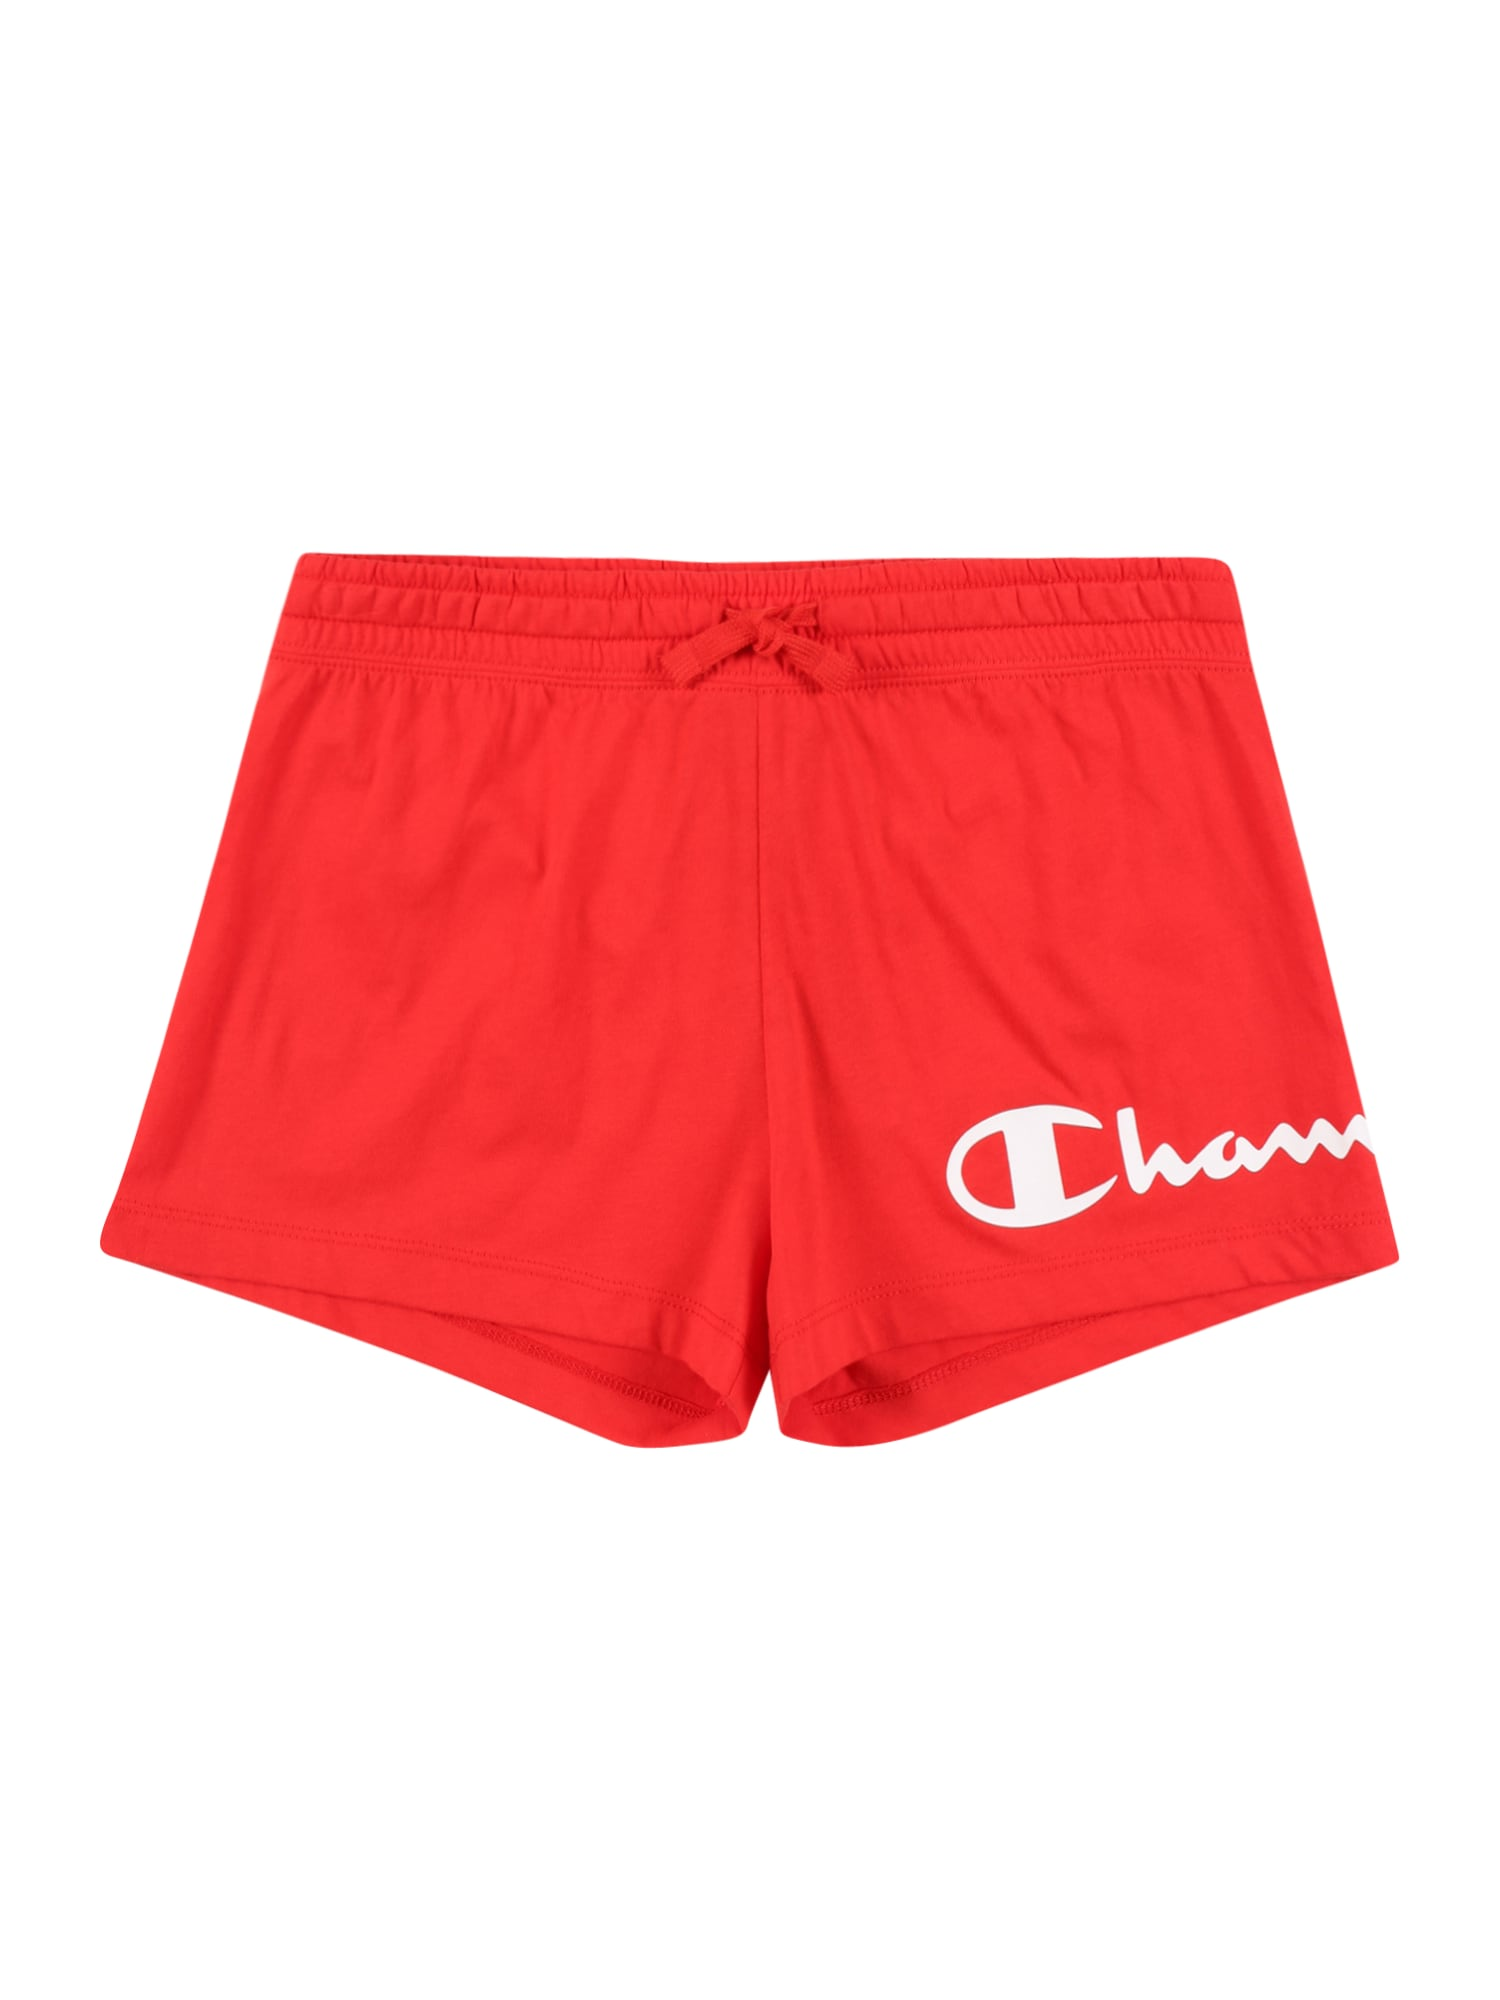 Champion Authentic Athletic Apparel Kelnės raudona / balta